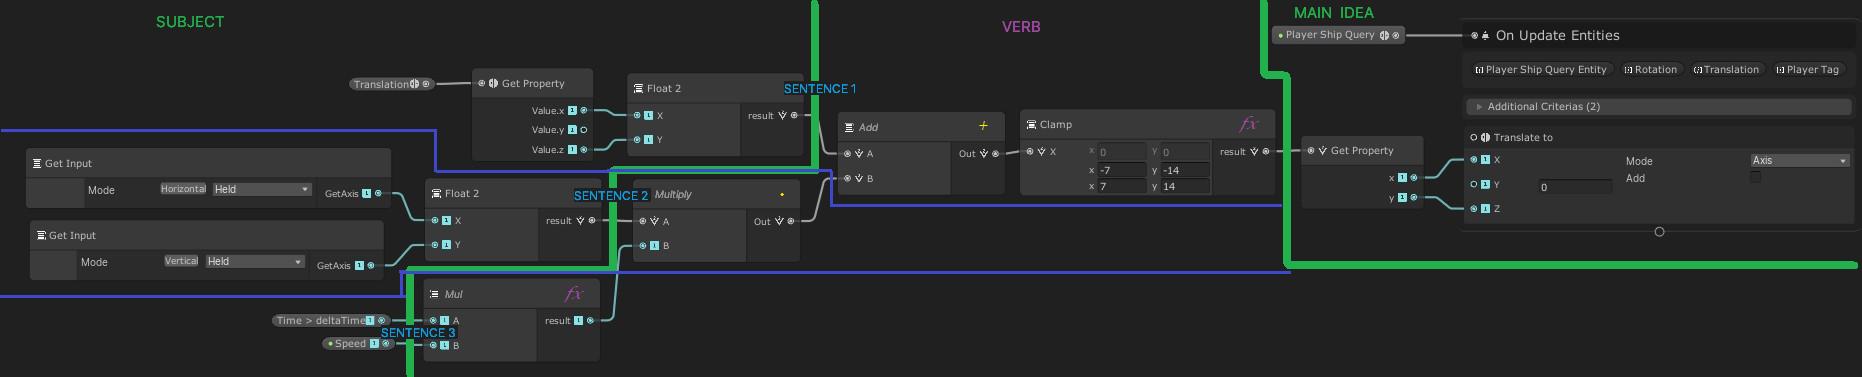 visual-scripting-language-sentences.png